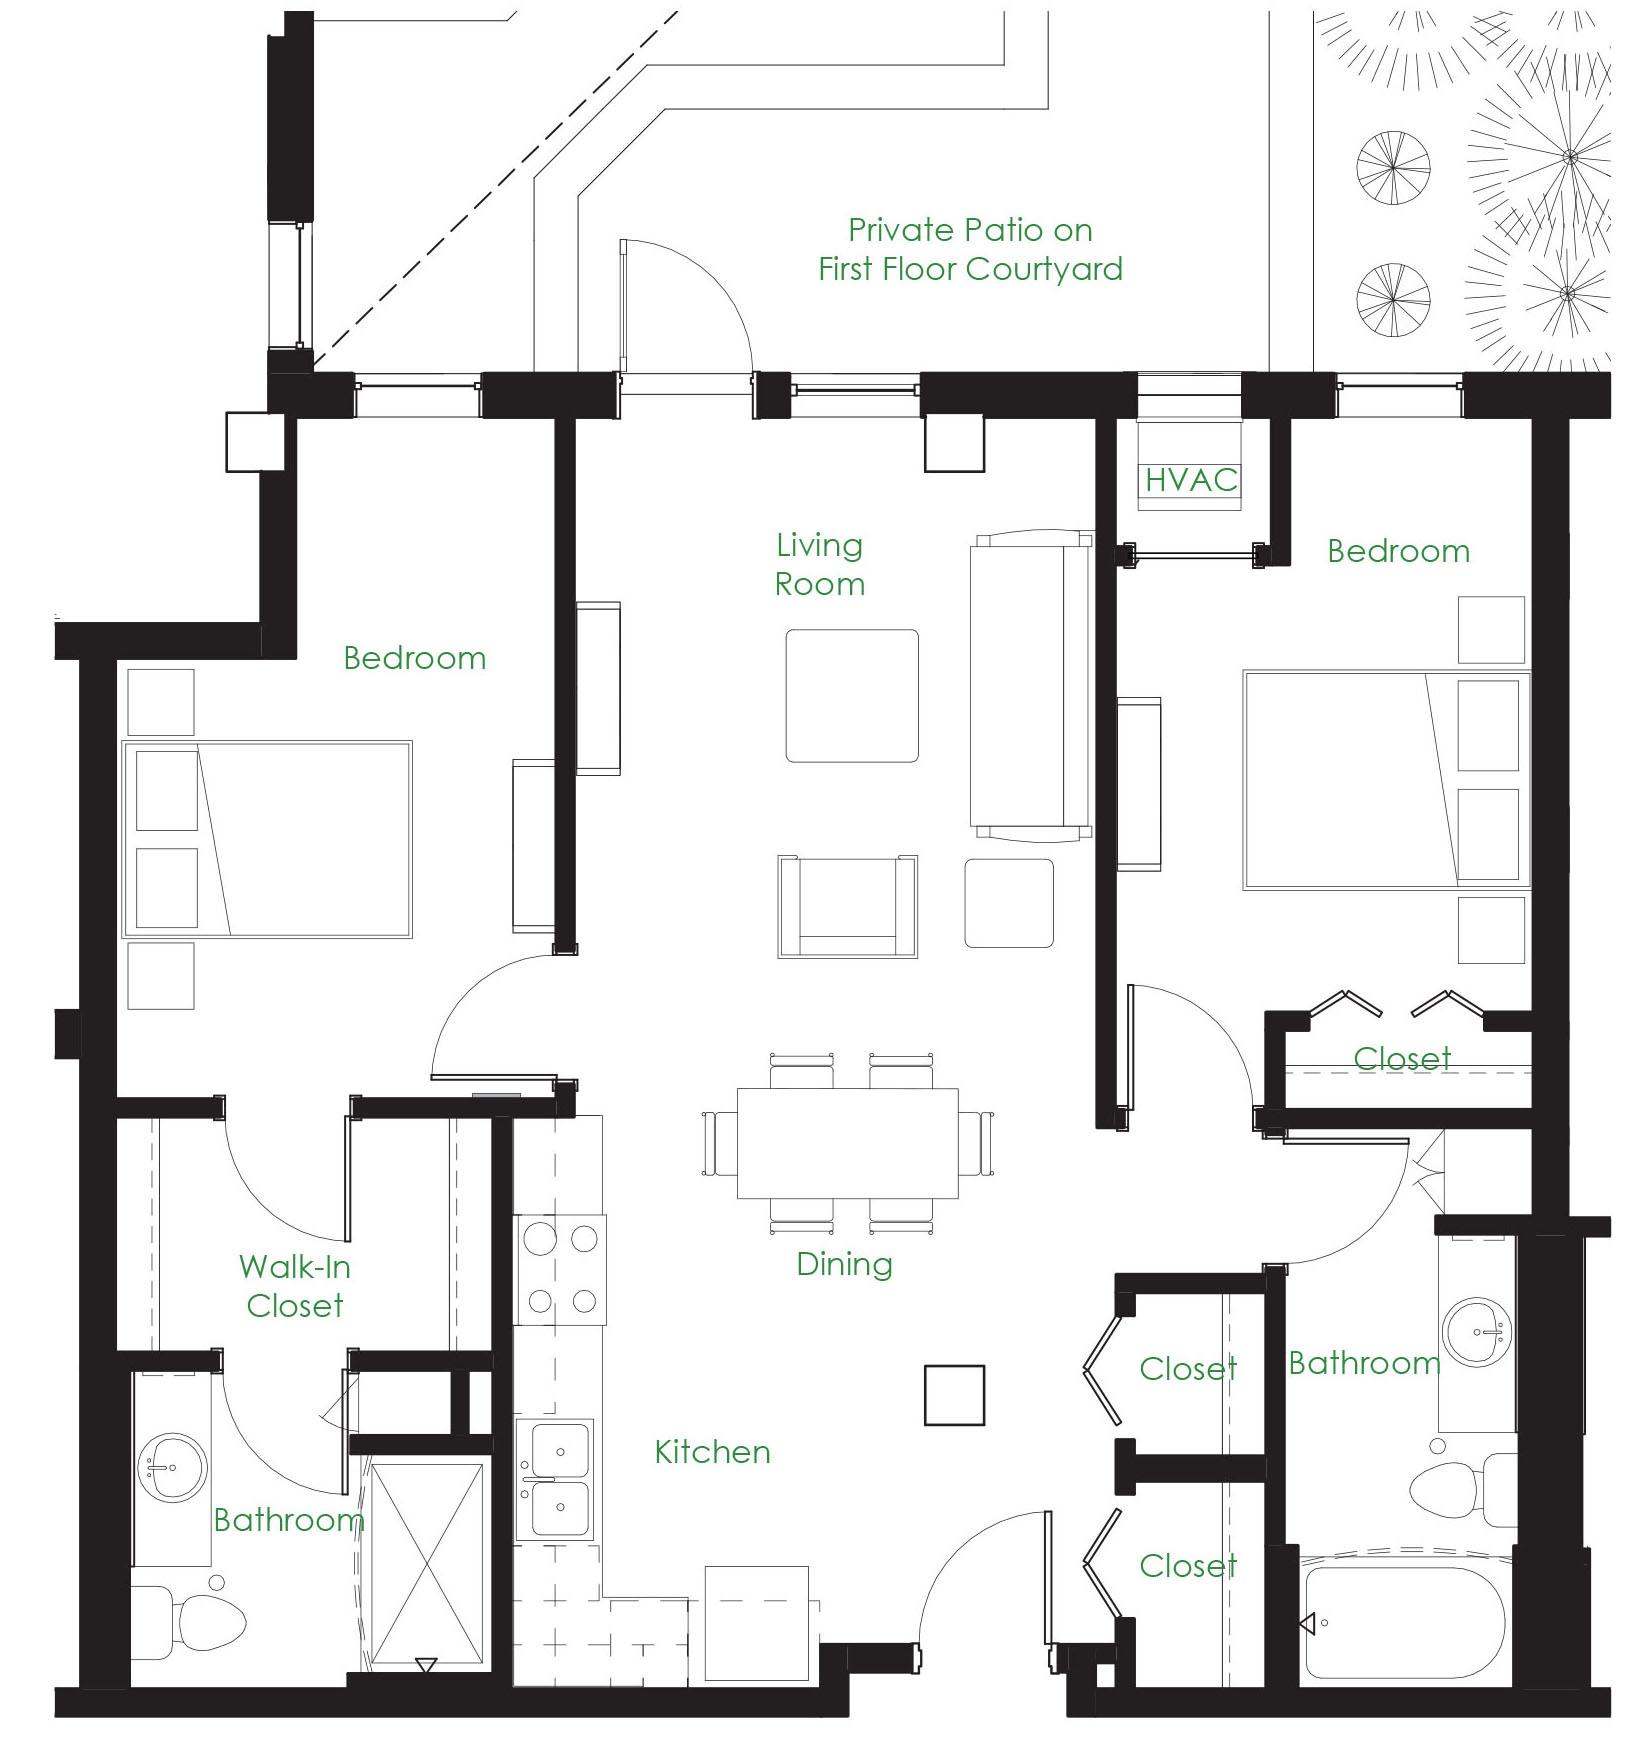 1 Bedroom Apartments Minneapolis: Two Bedroom Apartment Minneapolis MN